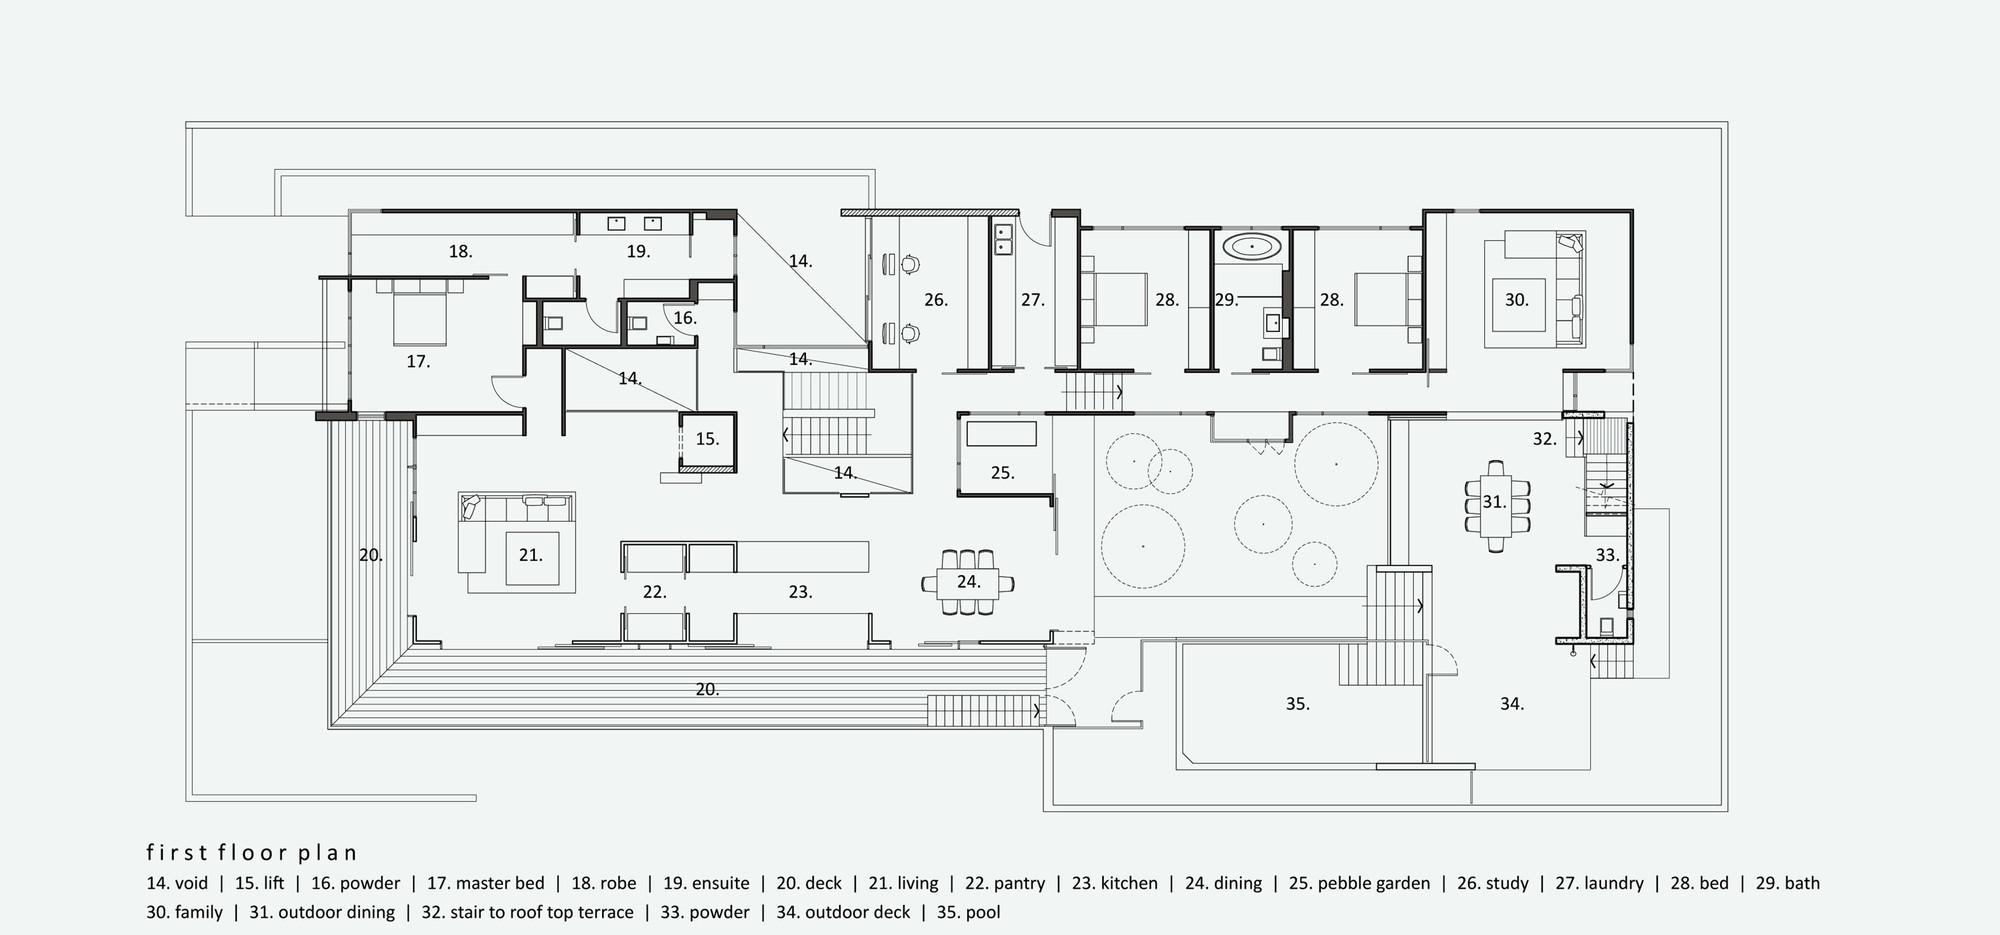 f2?1403237523 boarding house floor plans wood floors,Boarding House Plans